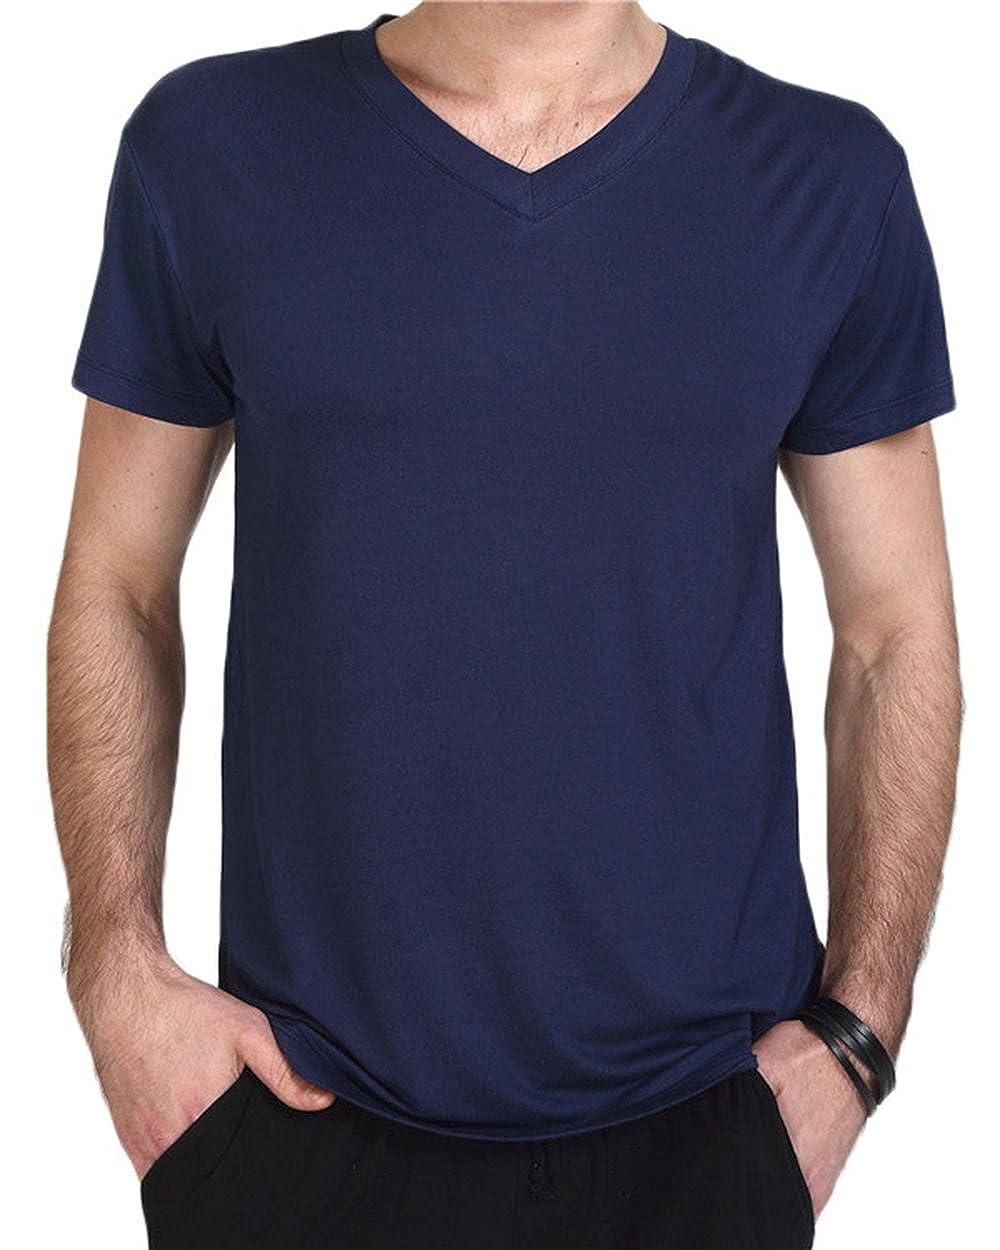 Wantschun Herren Nachtwä sche T-Shirt Top Tee Shirt Schlafanzug Pyjama Hausanzug